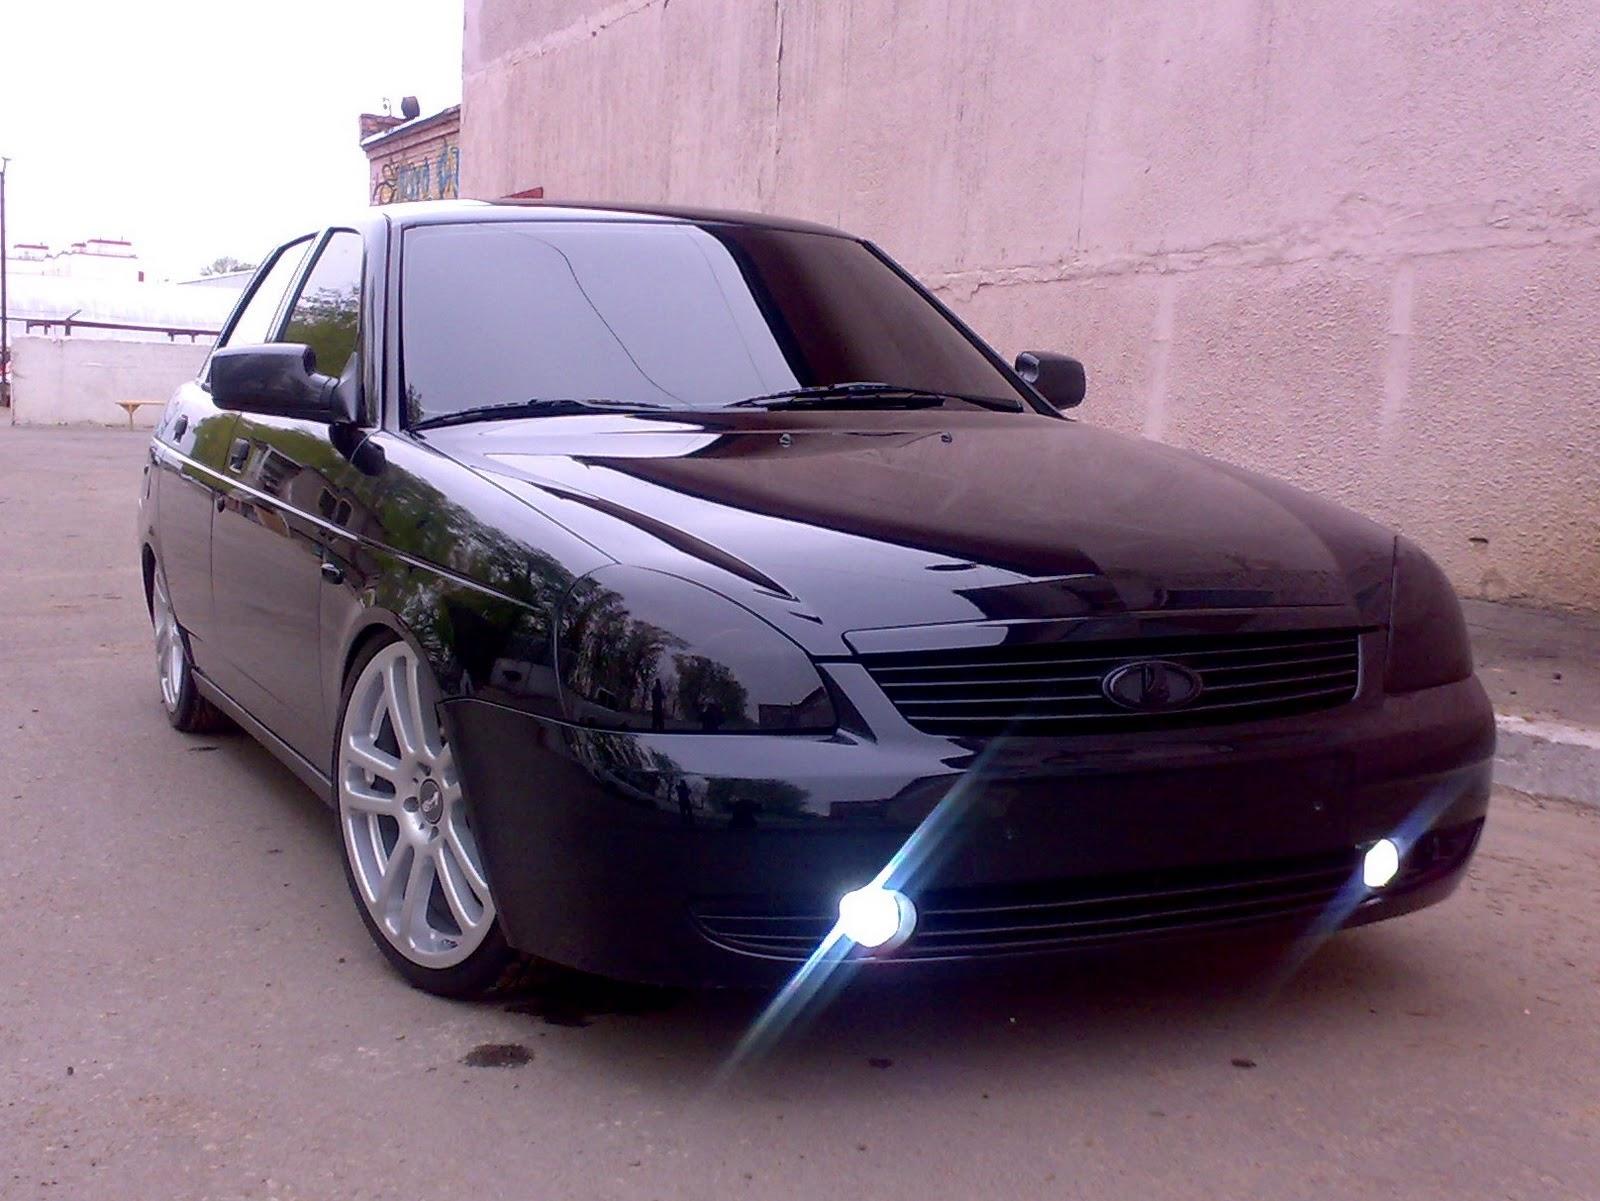 Фото калина приора - Бампера ВАЗ ( Лада ) , Chevrolet Niva, ОКА в